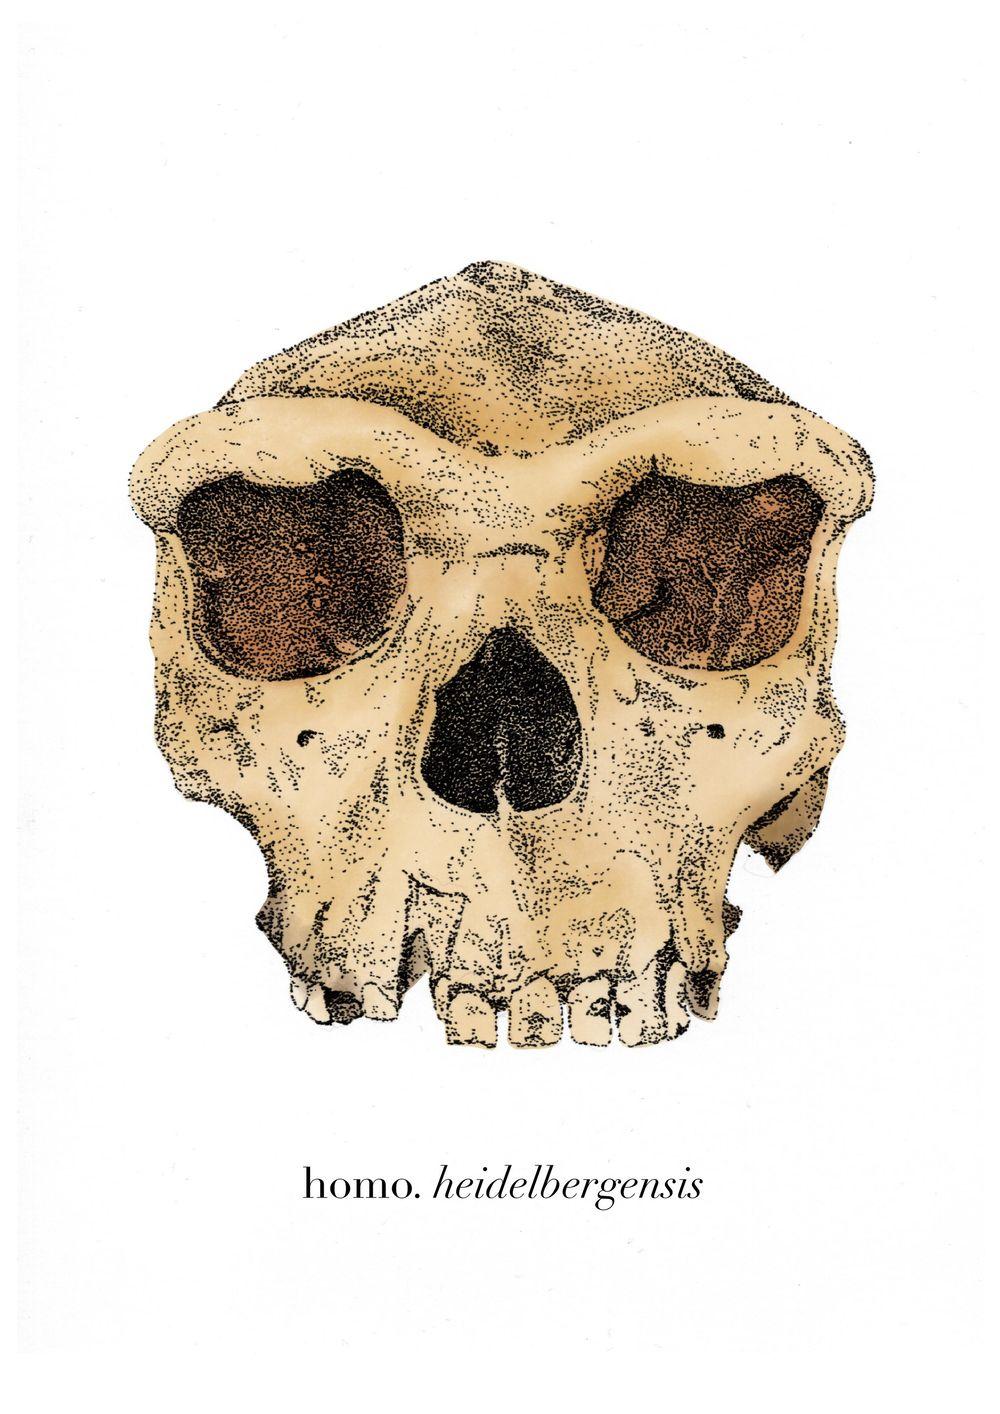 Homo heidelbergensis - image 2 - student project